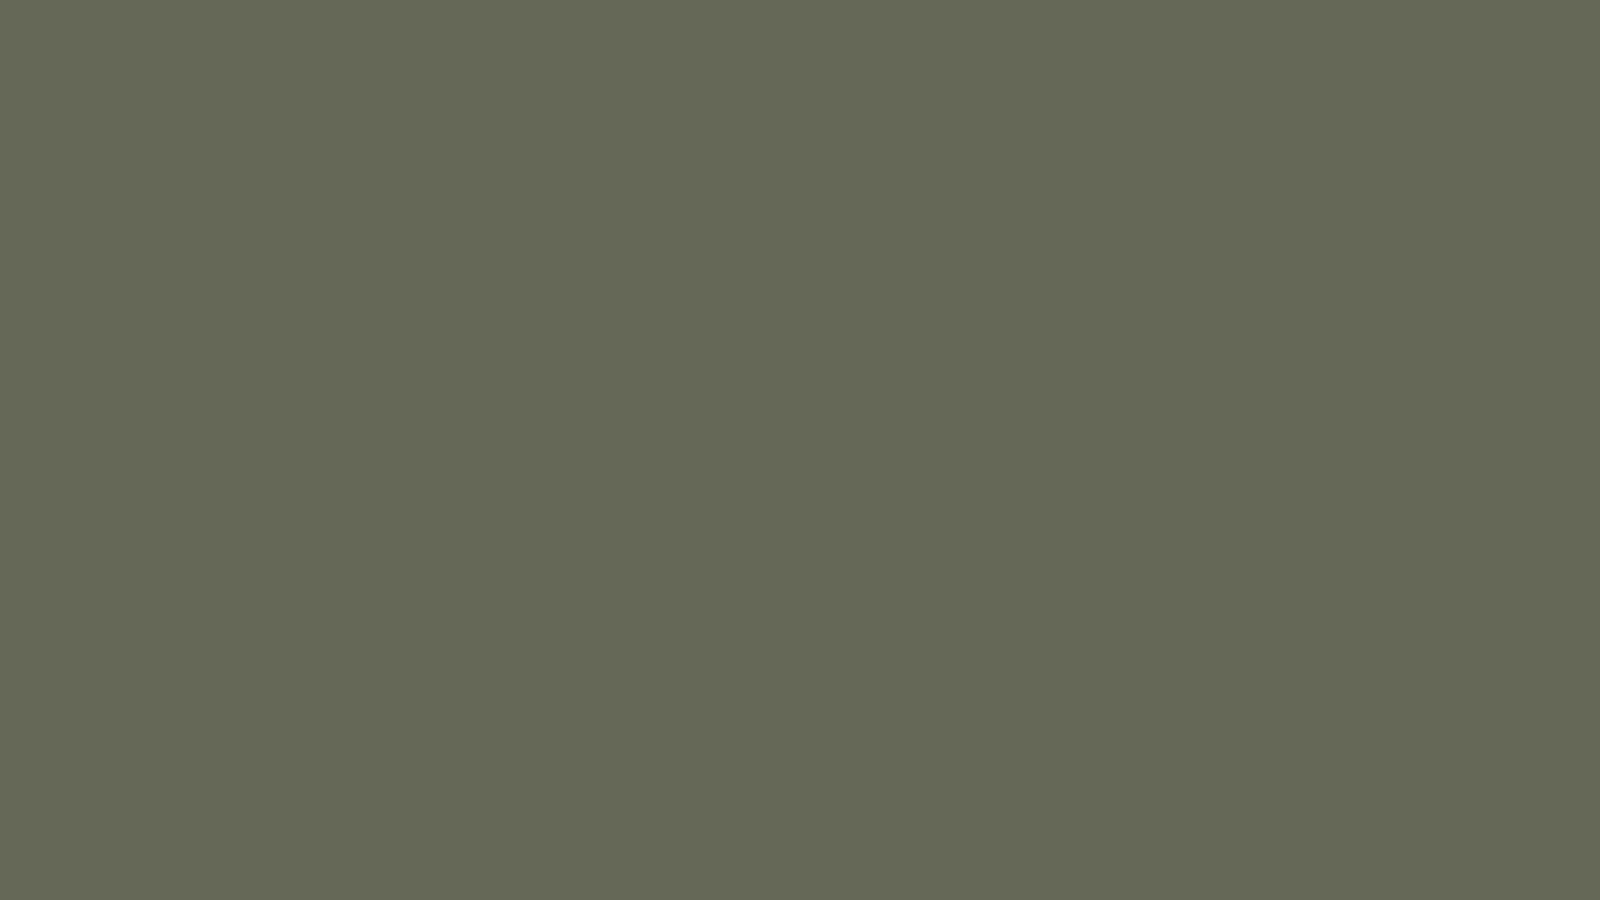 Лента ABS 055 Глянцевая 23х1мм, Cammello (верблюжий)